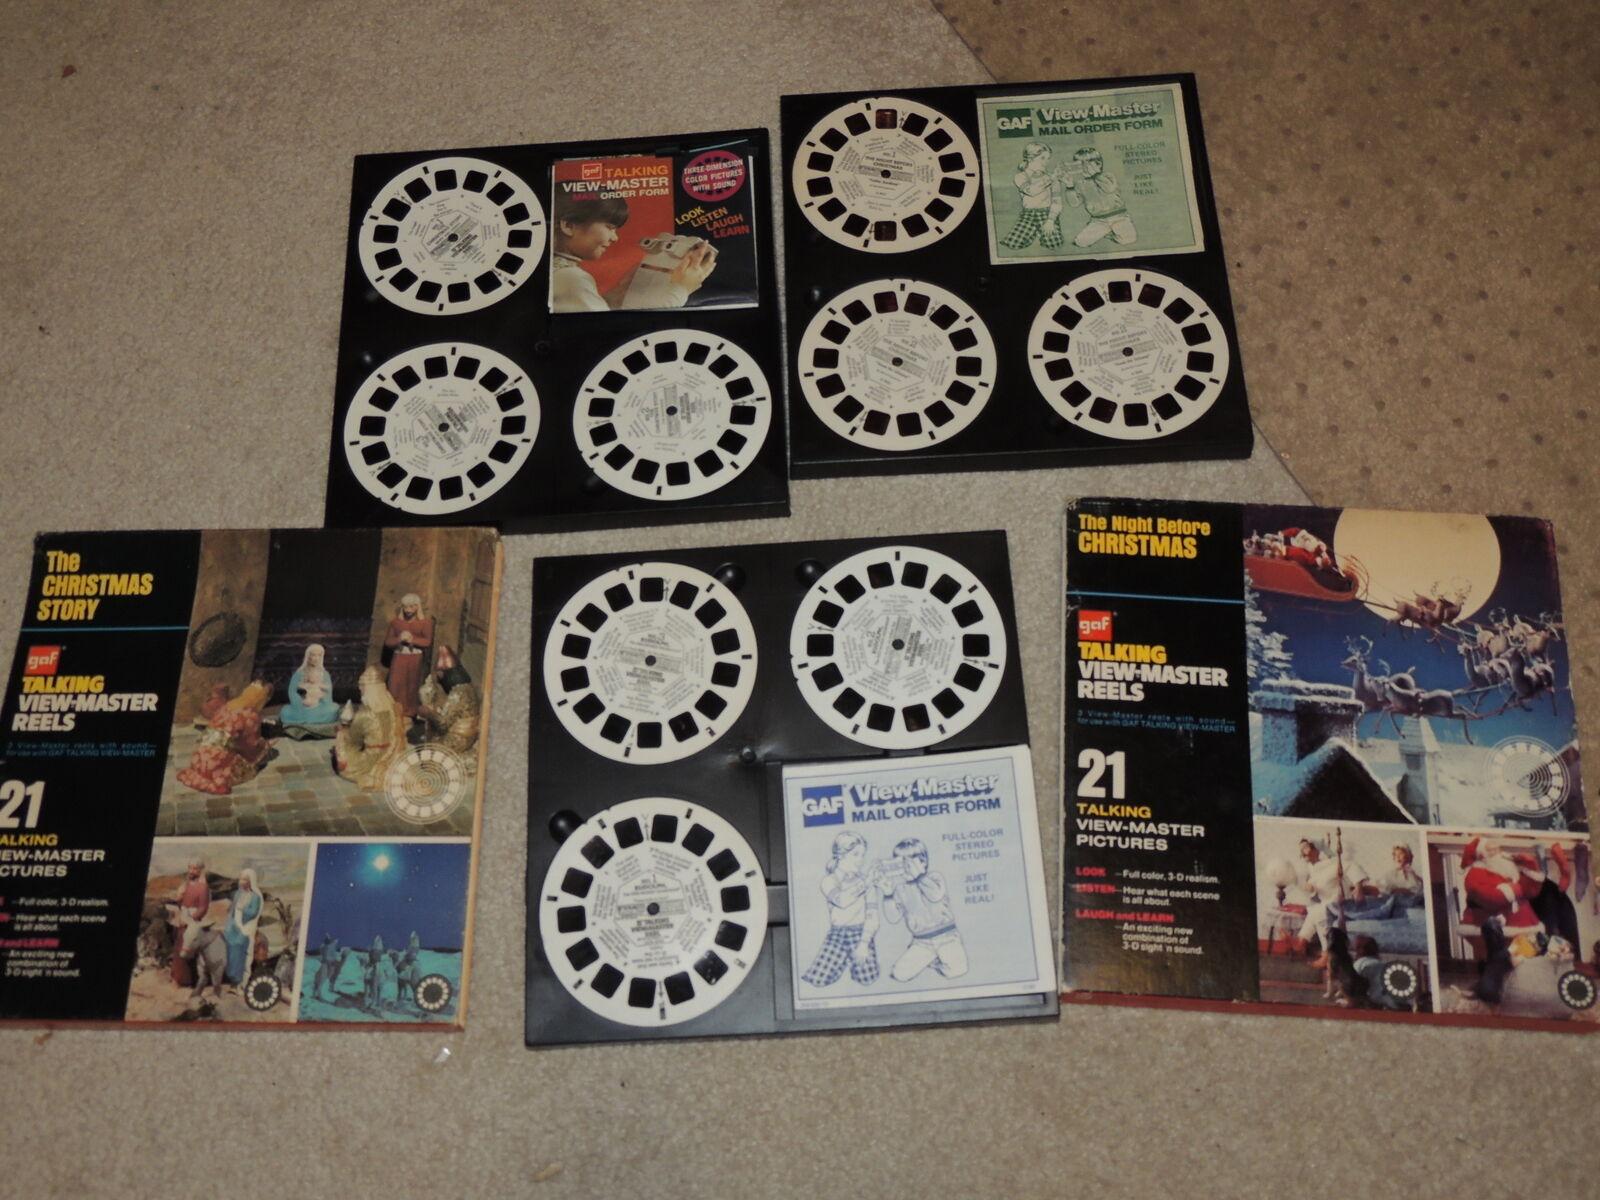 Talking Viewmaster Lot of 5 Christmas Stereo Reel Sets